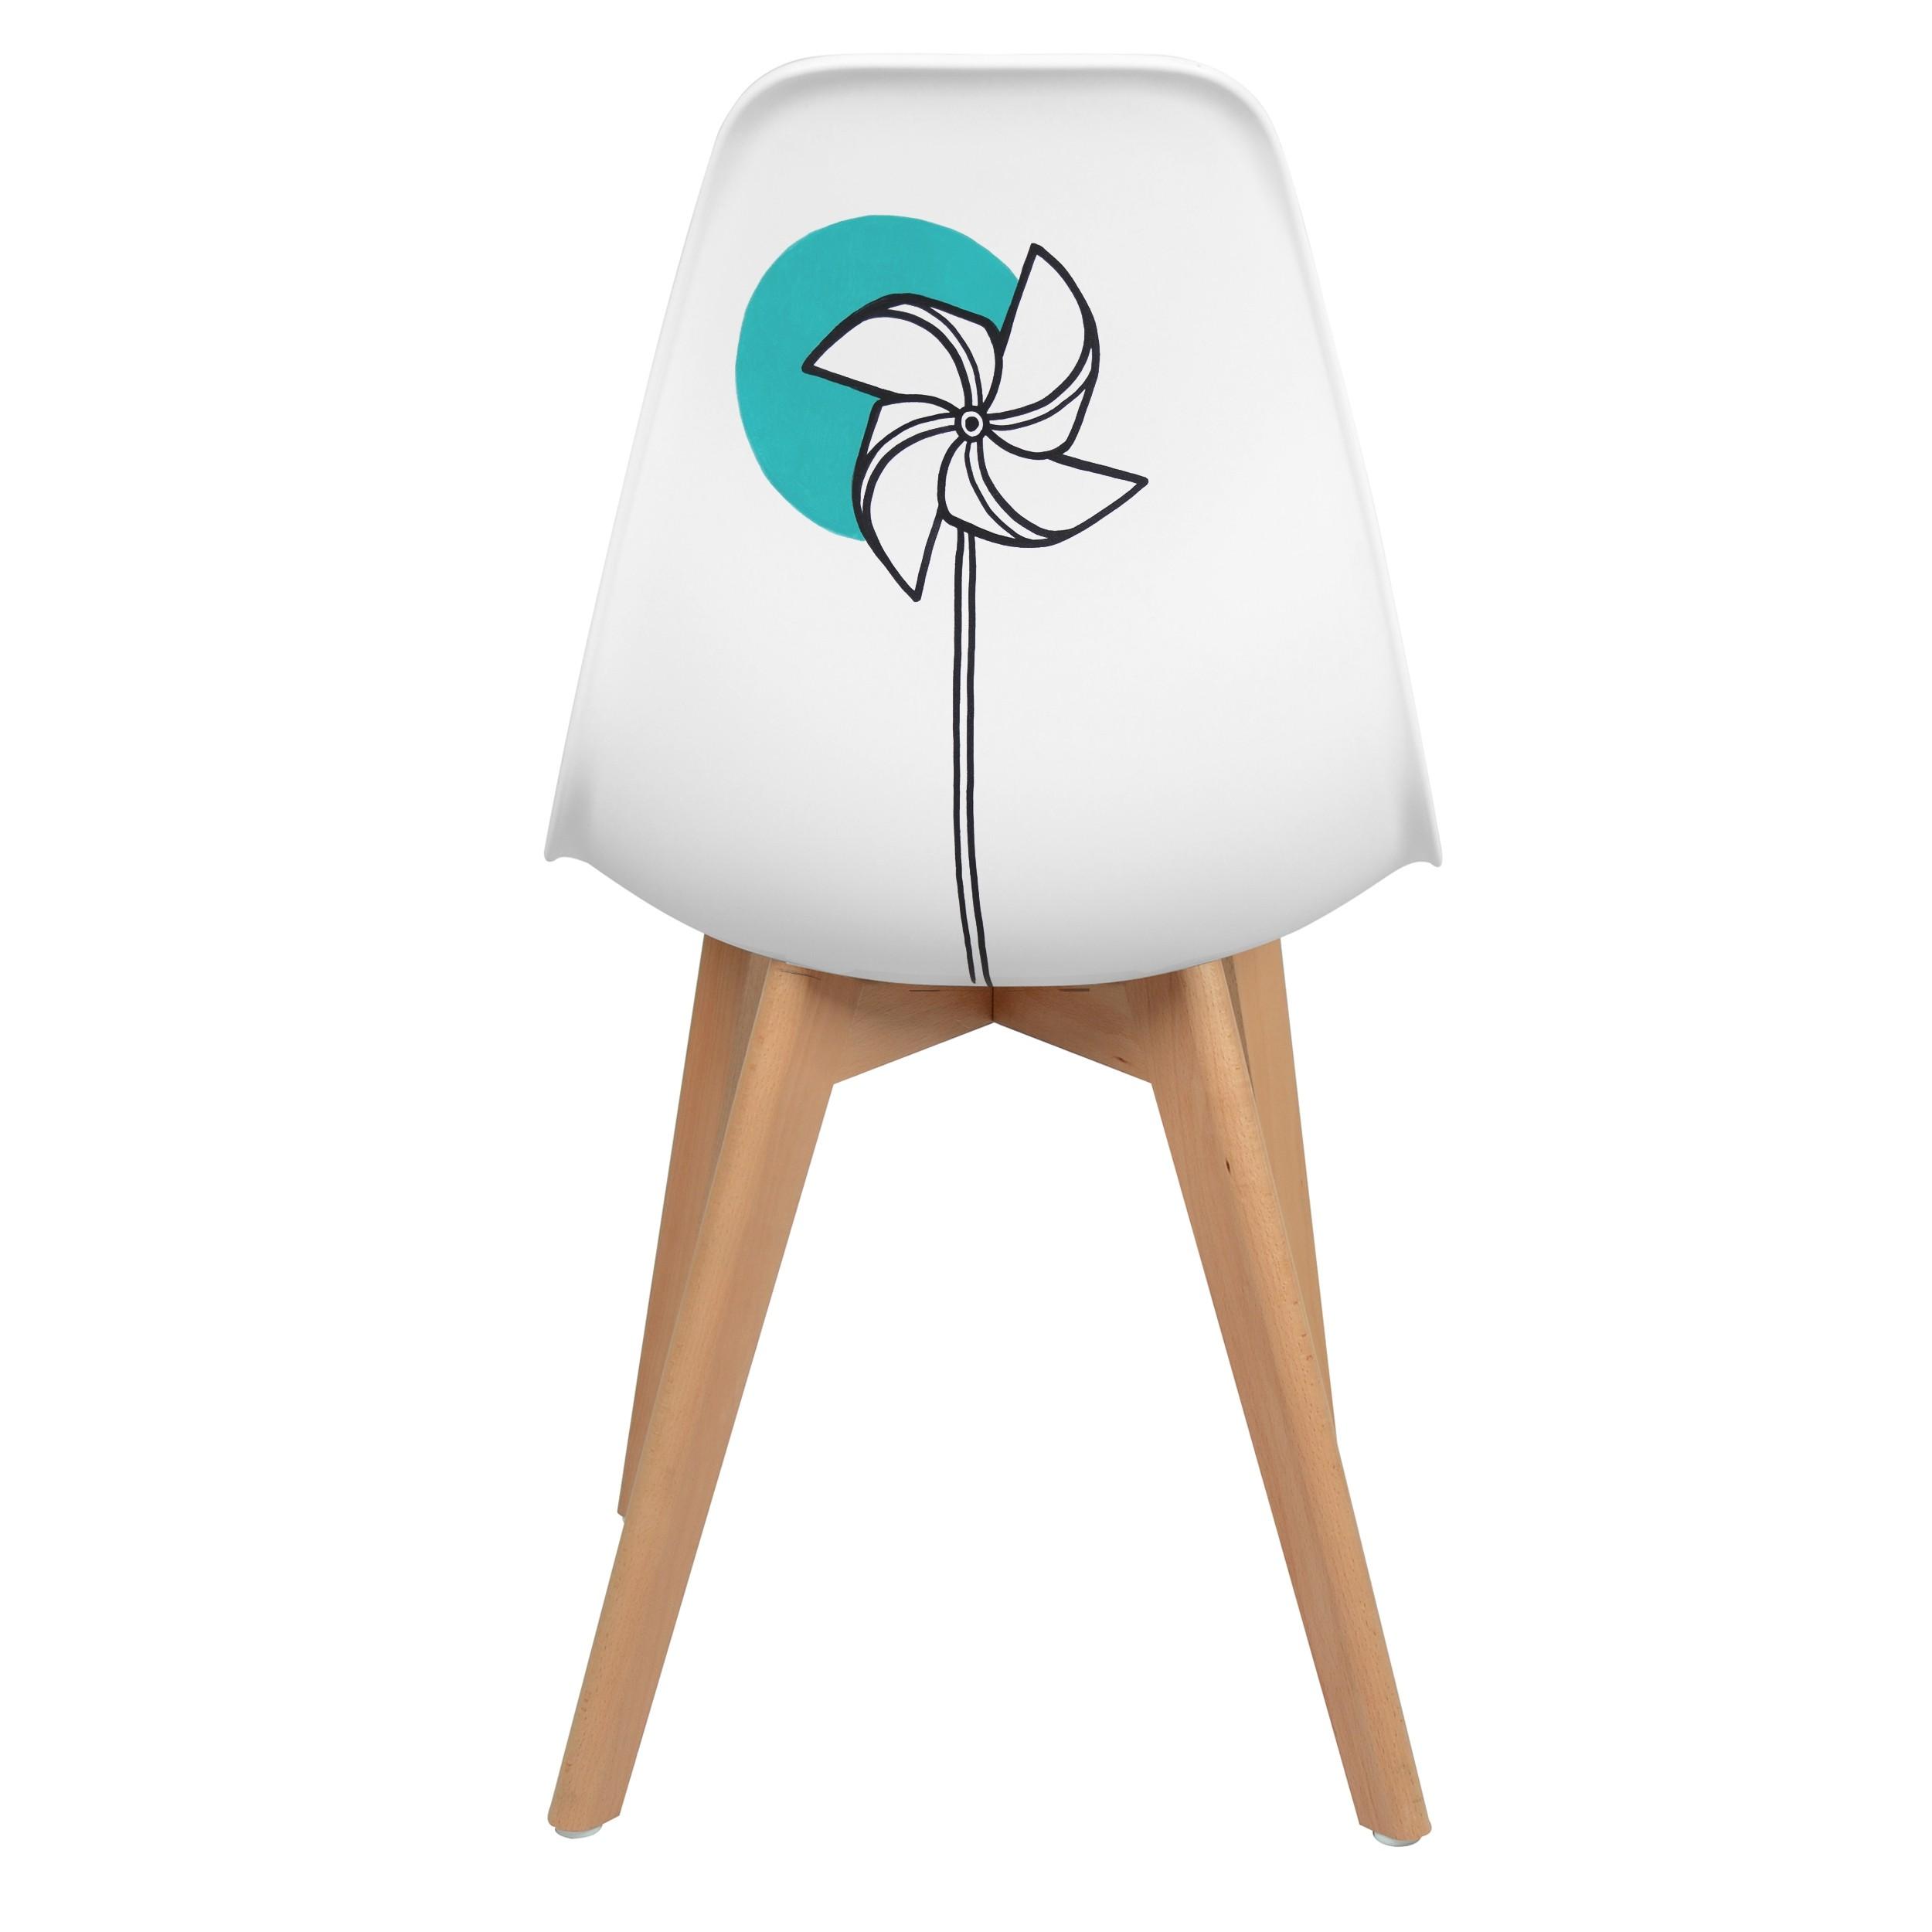 acheter chaise d artiste pas cher